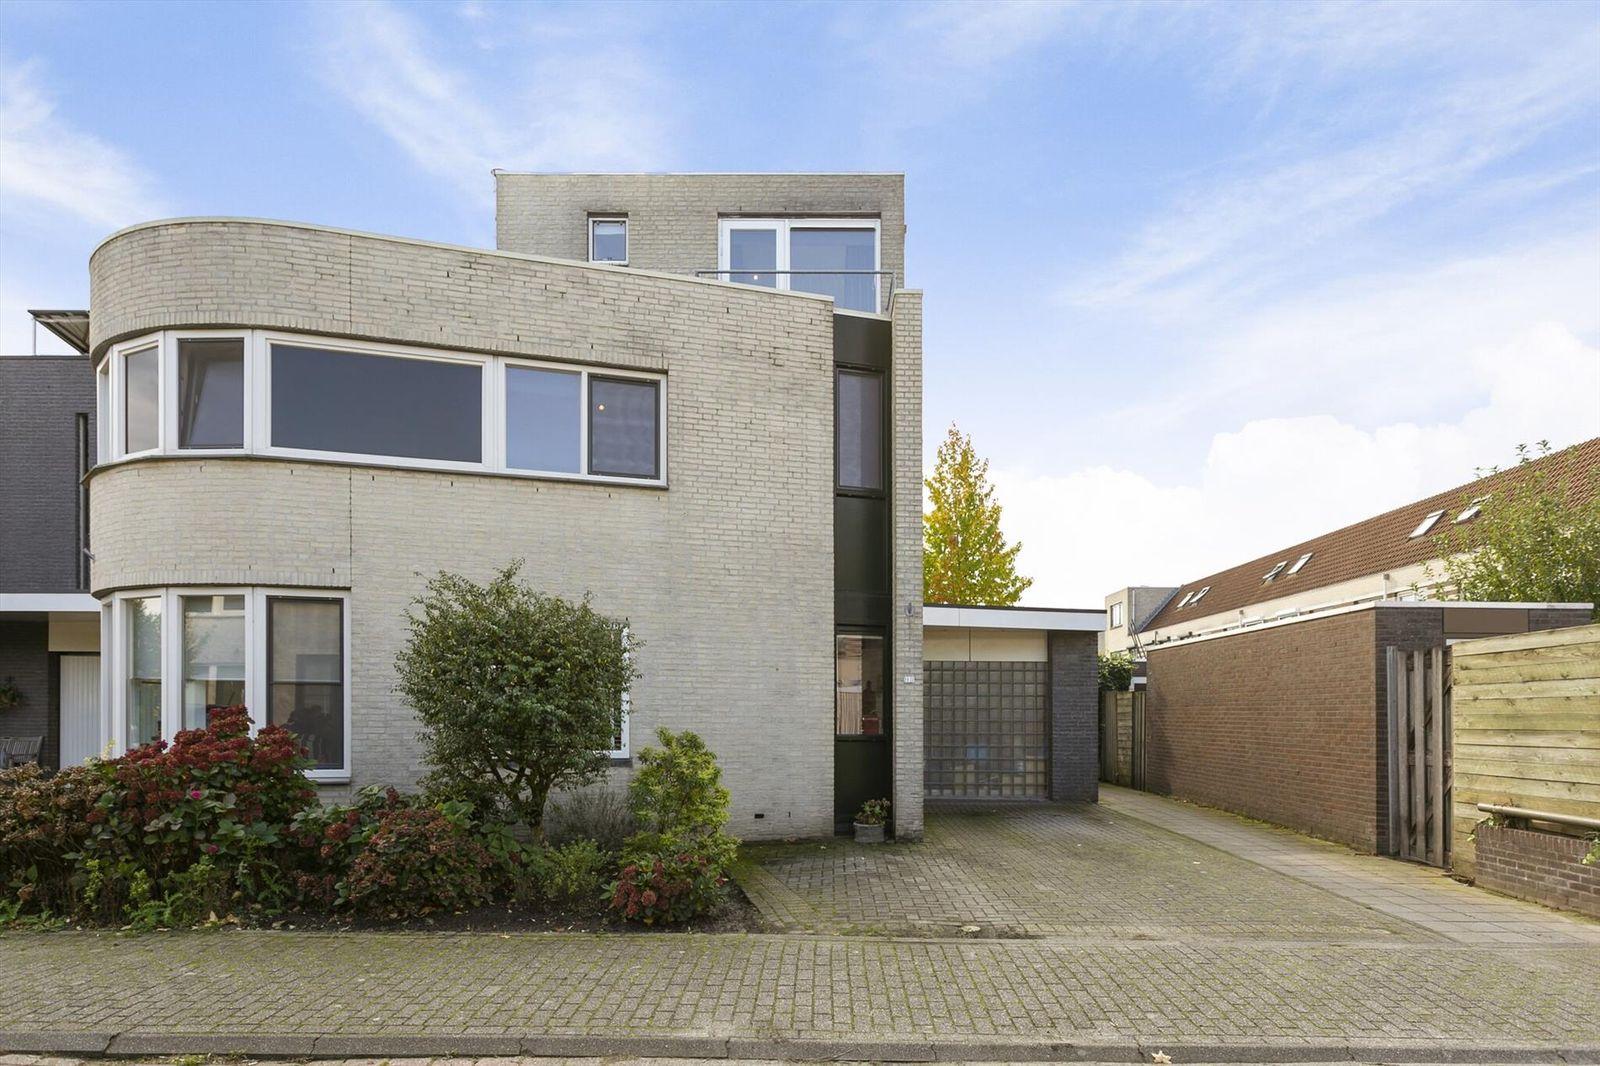 Rijkevoortstraat 12, Tilburg